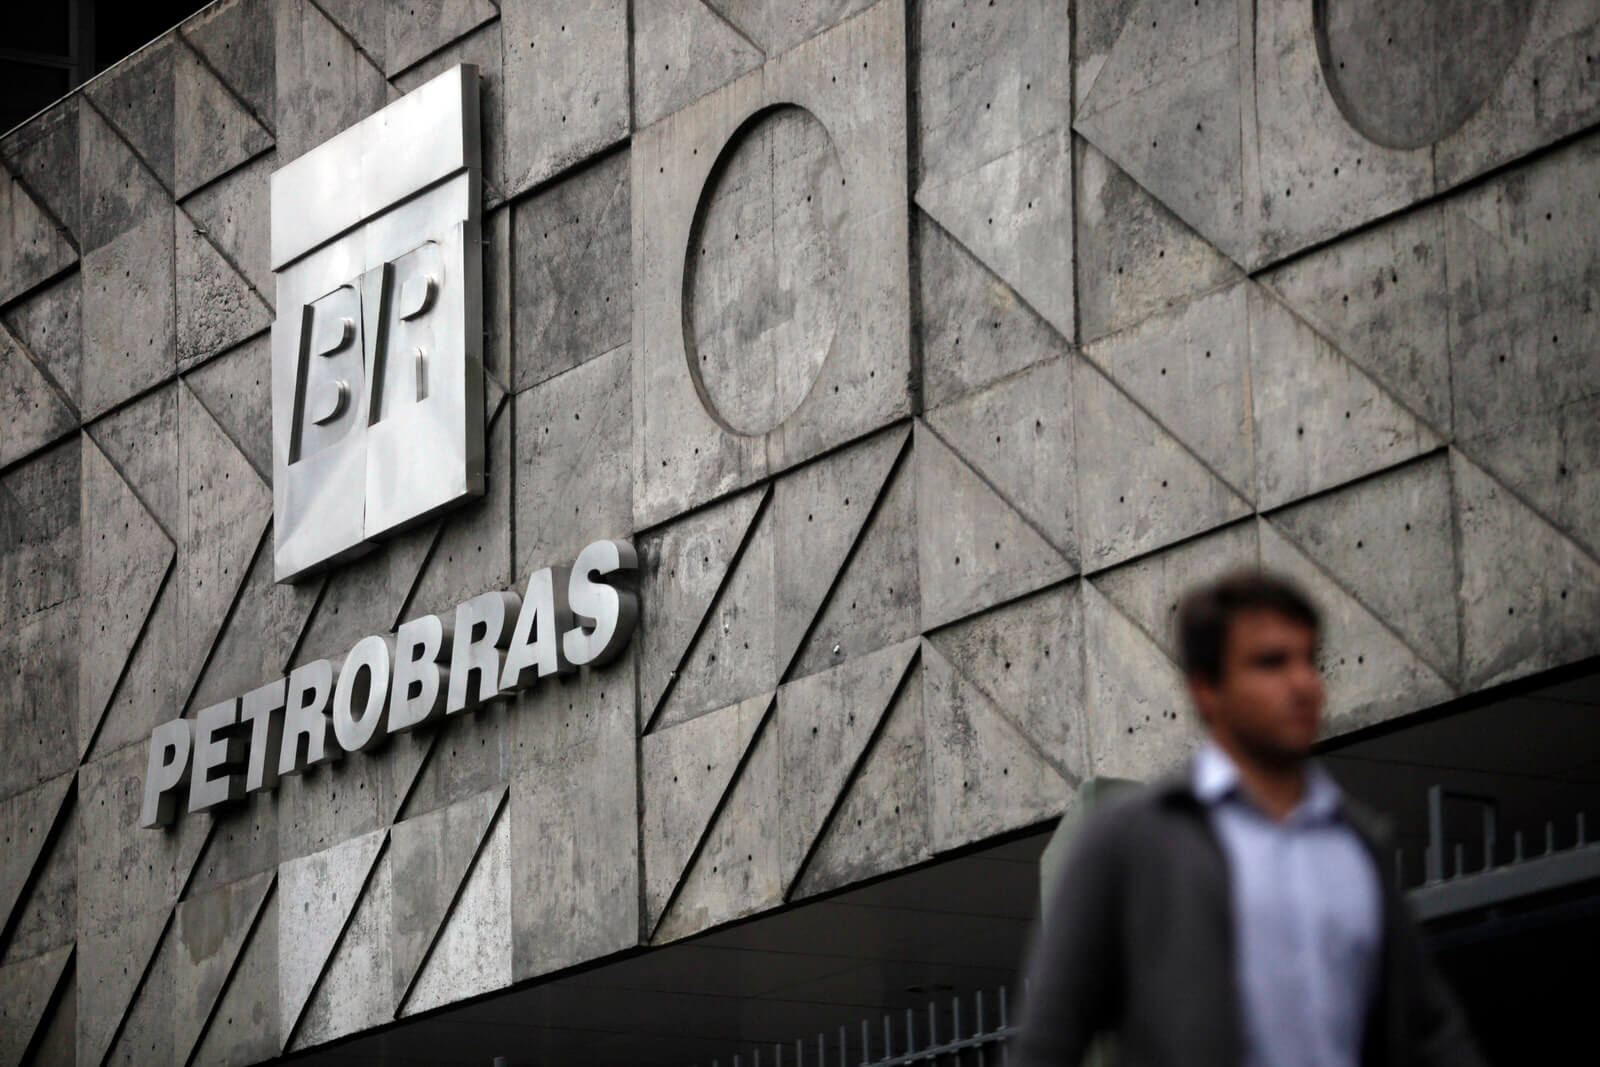 Petrobras/Bloomberg